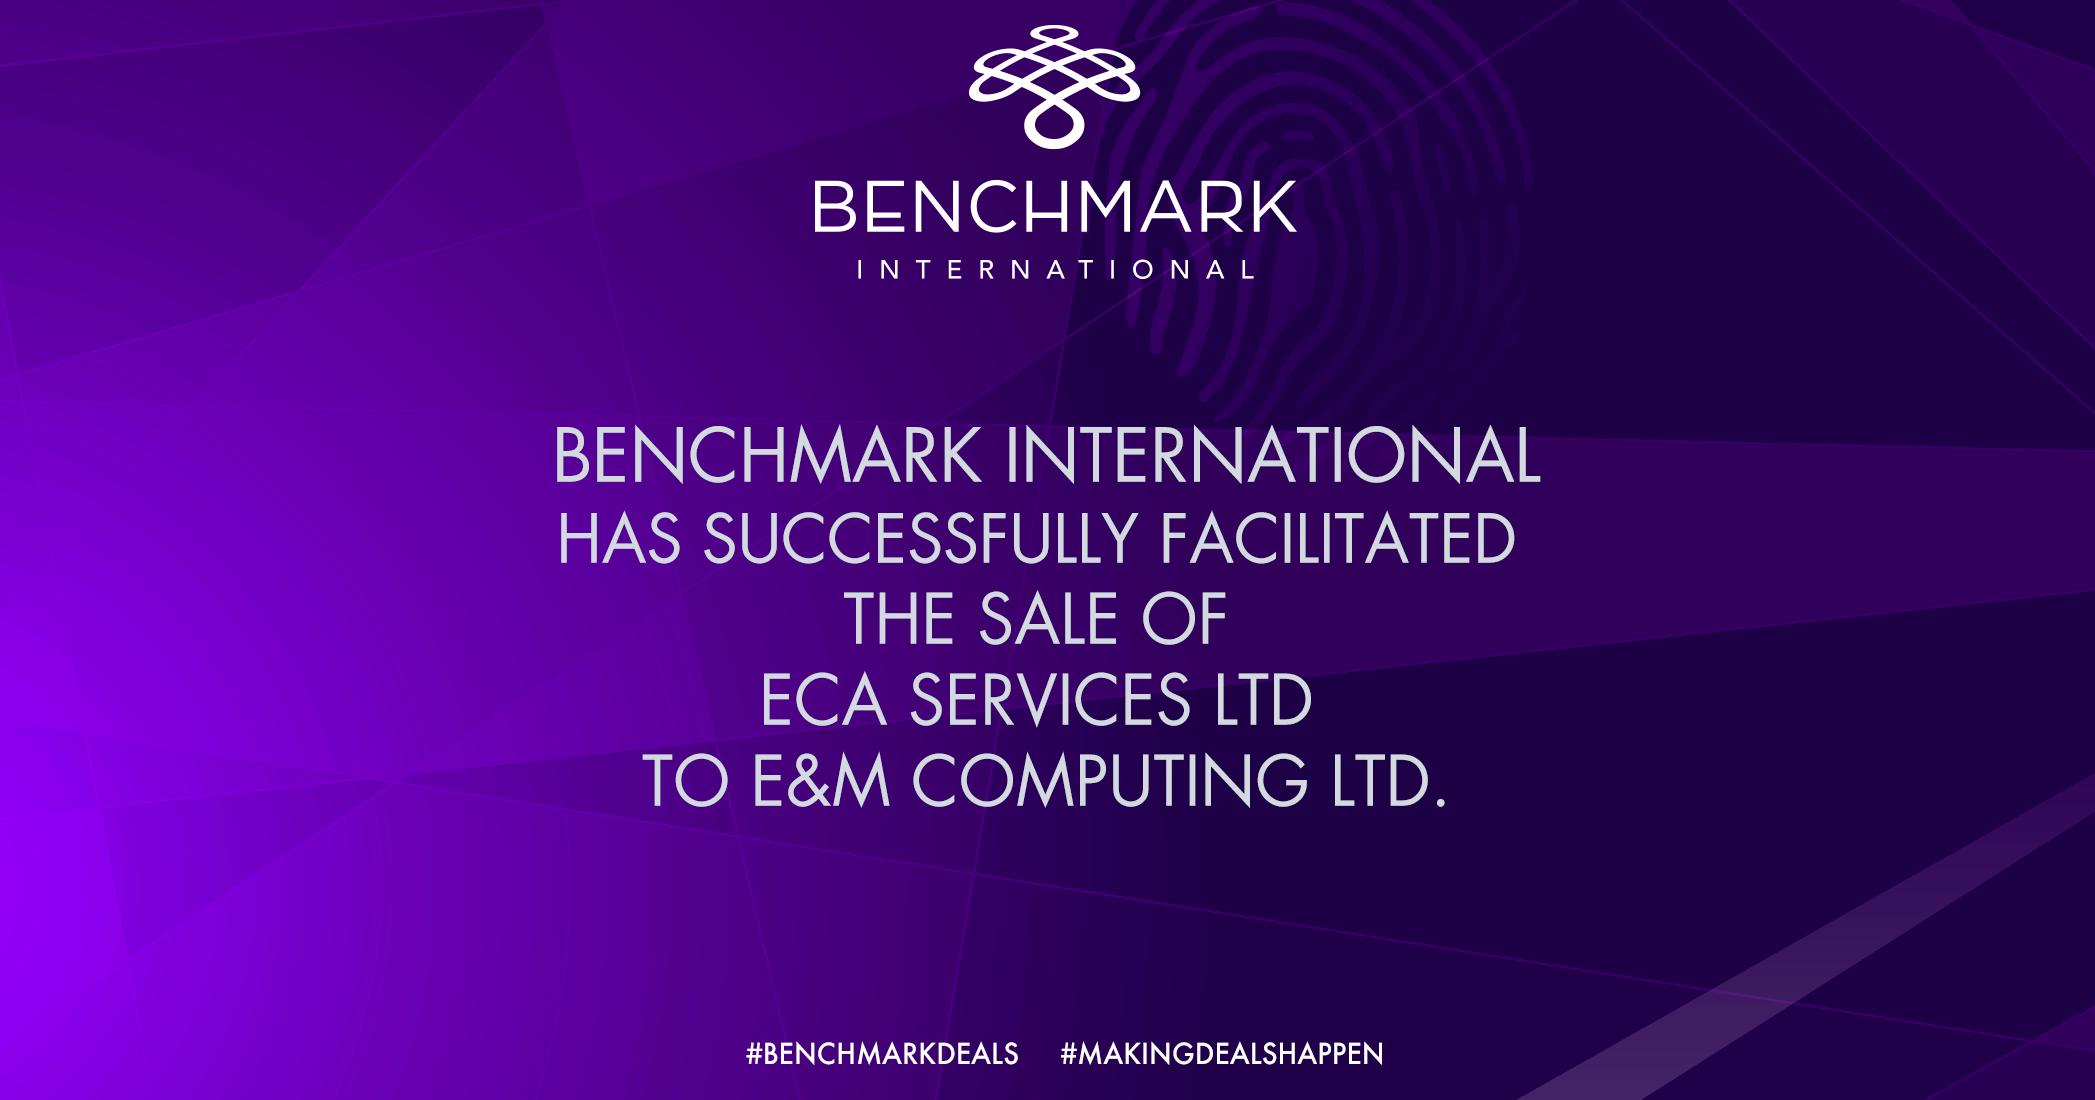 Benchmark International has Successfully Facilitated the Sale of ECA Services Ltd to E&M Computing Ltd